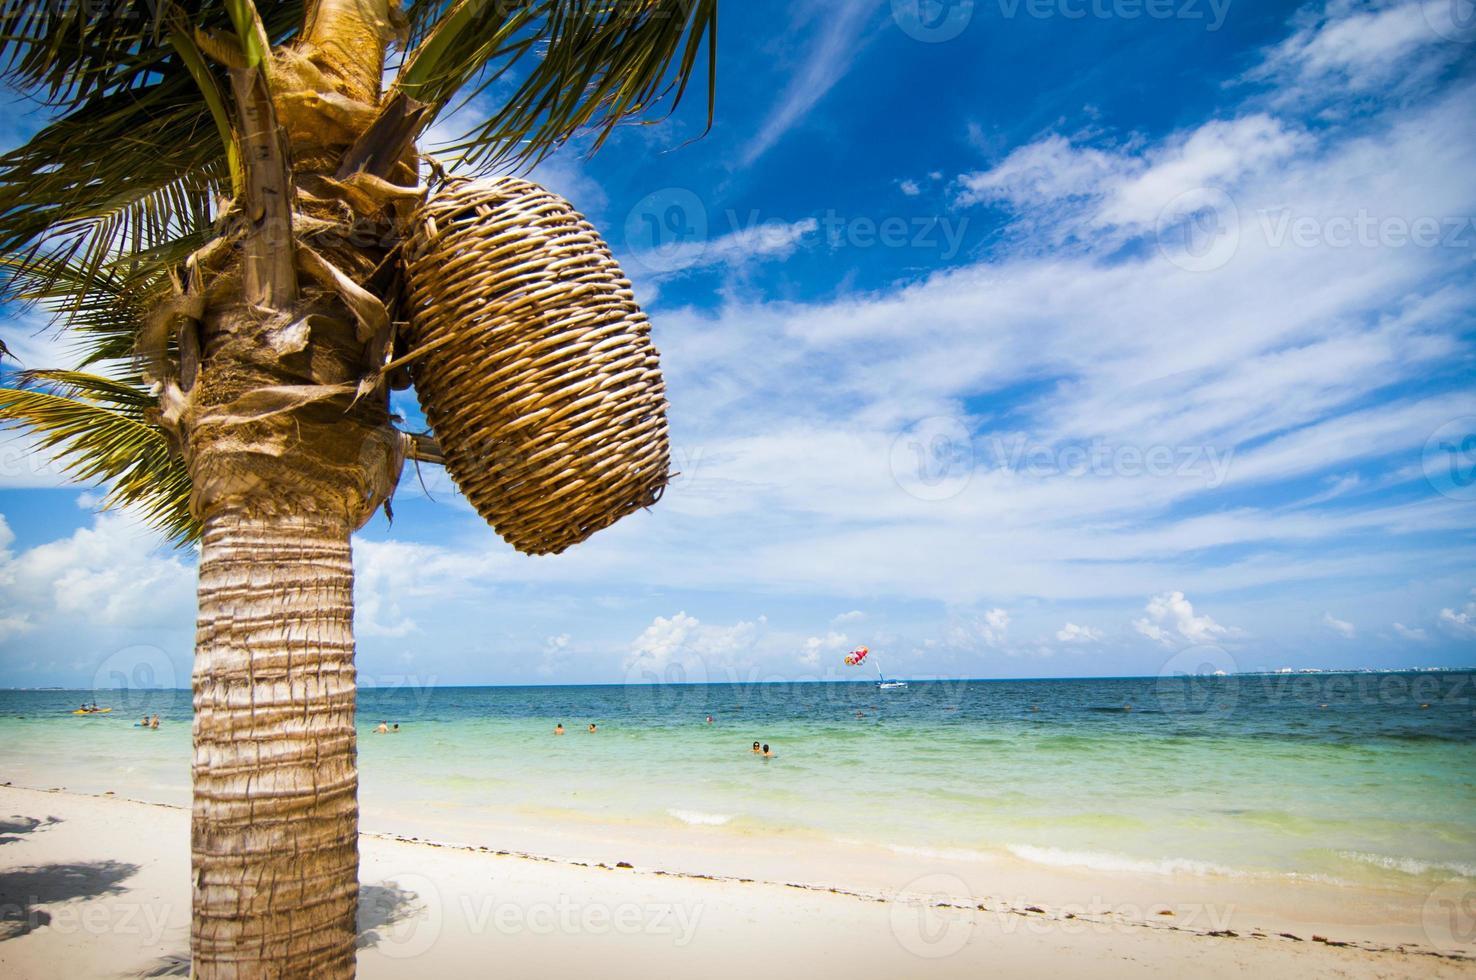 Woven Basket on Palm Tree on Carribean Beach photo